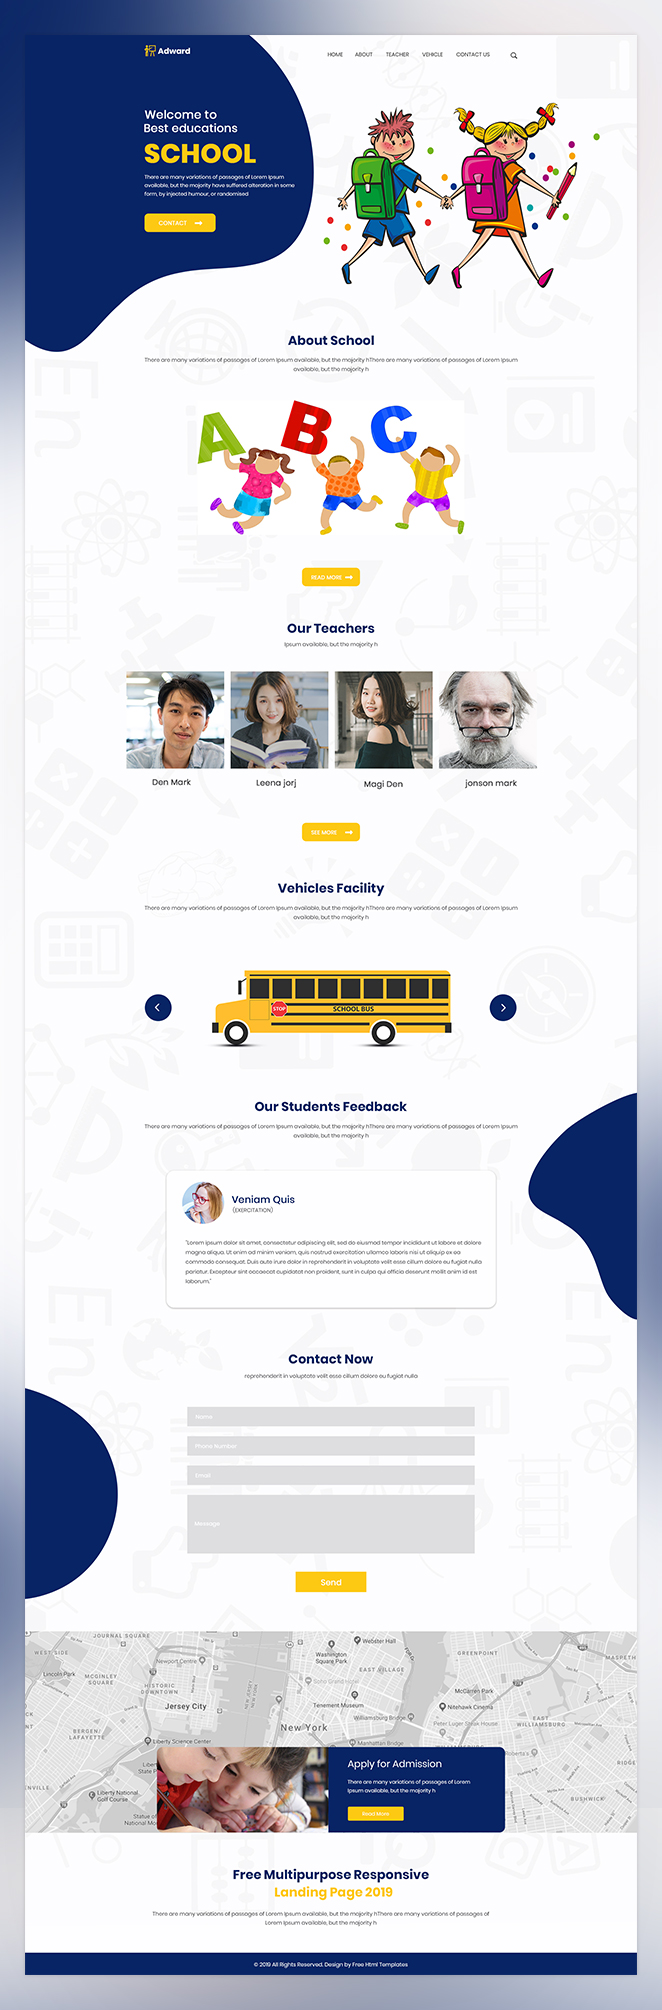 Adward school website adviser psd template